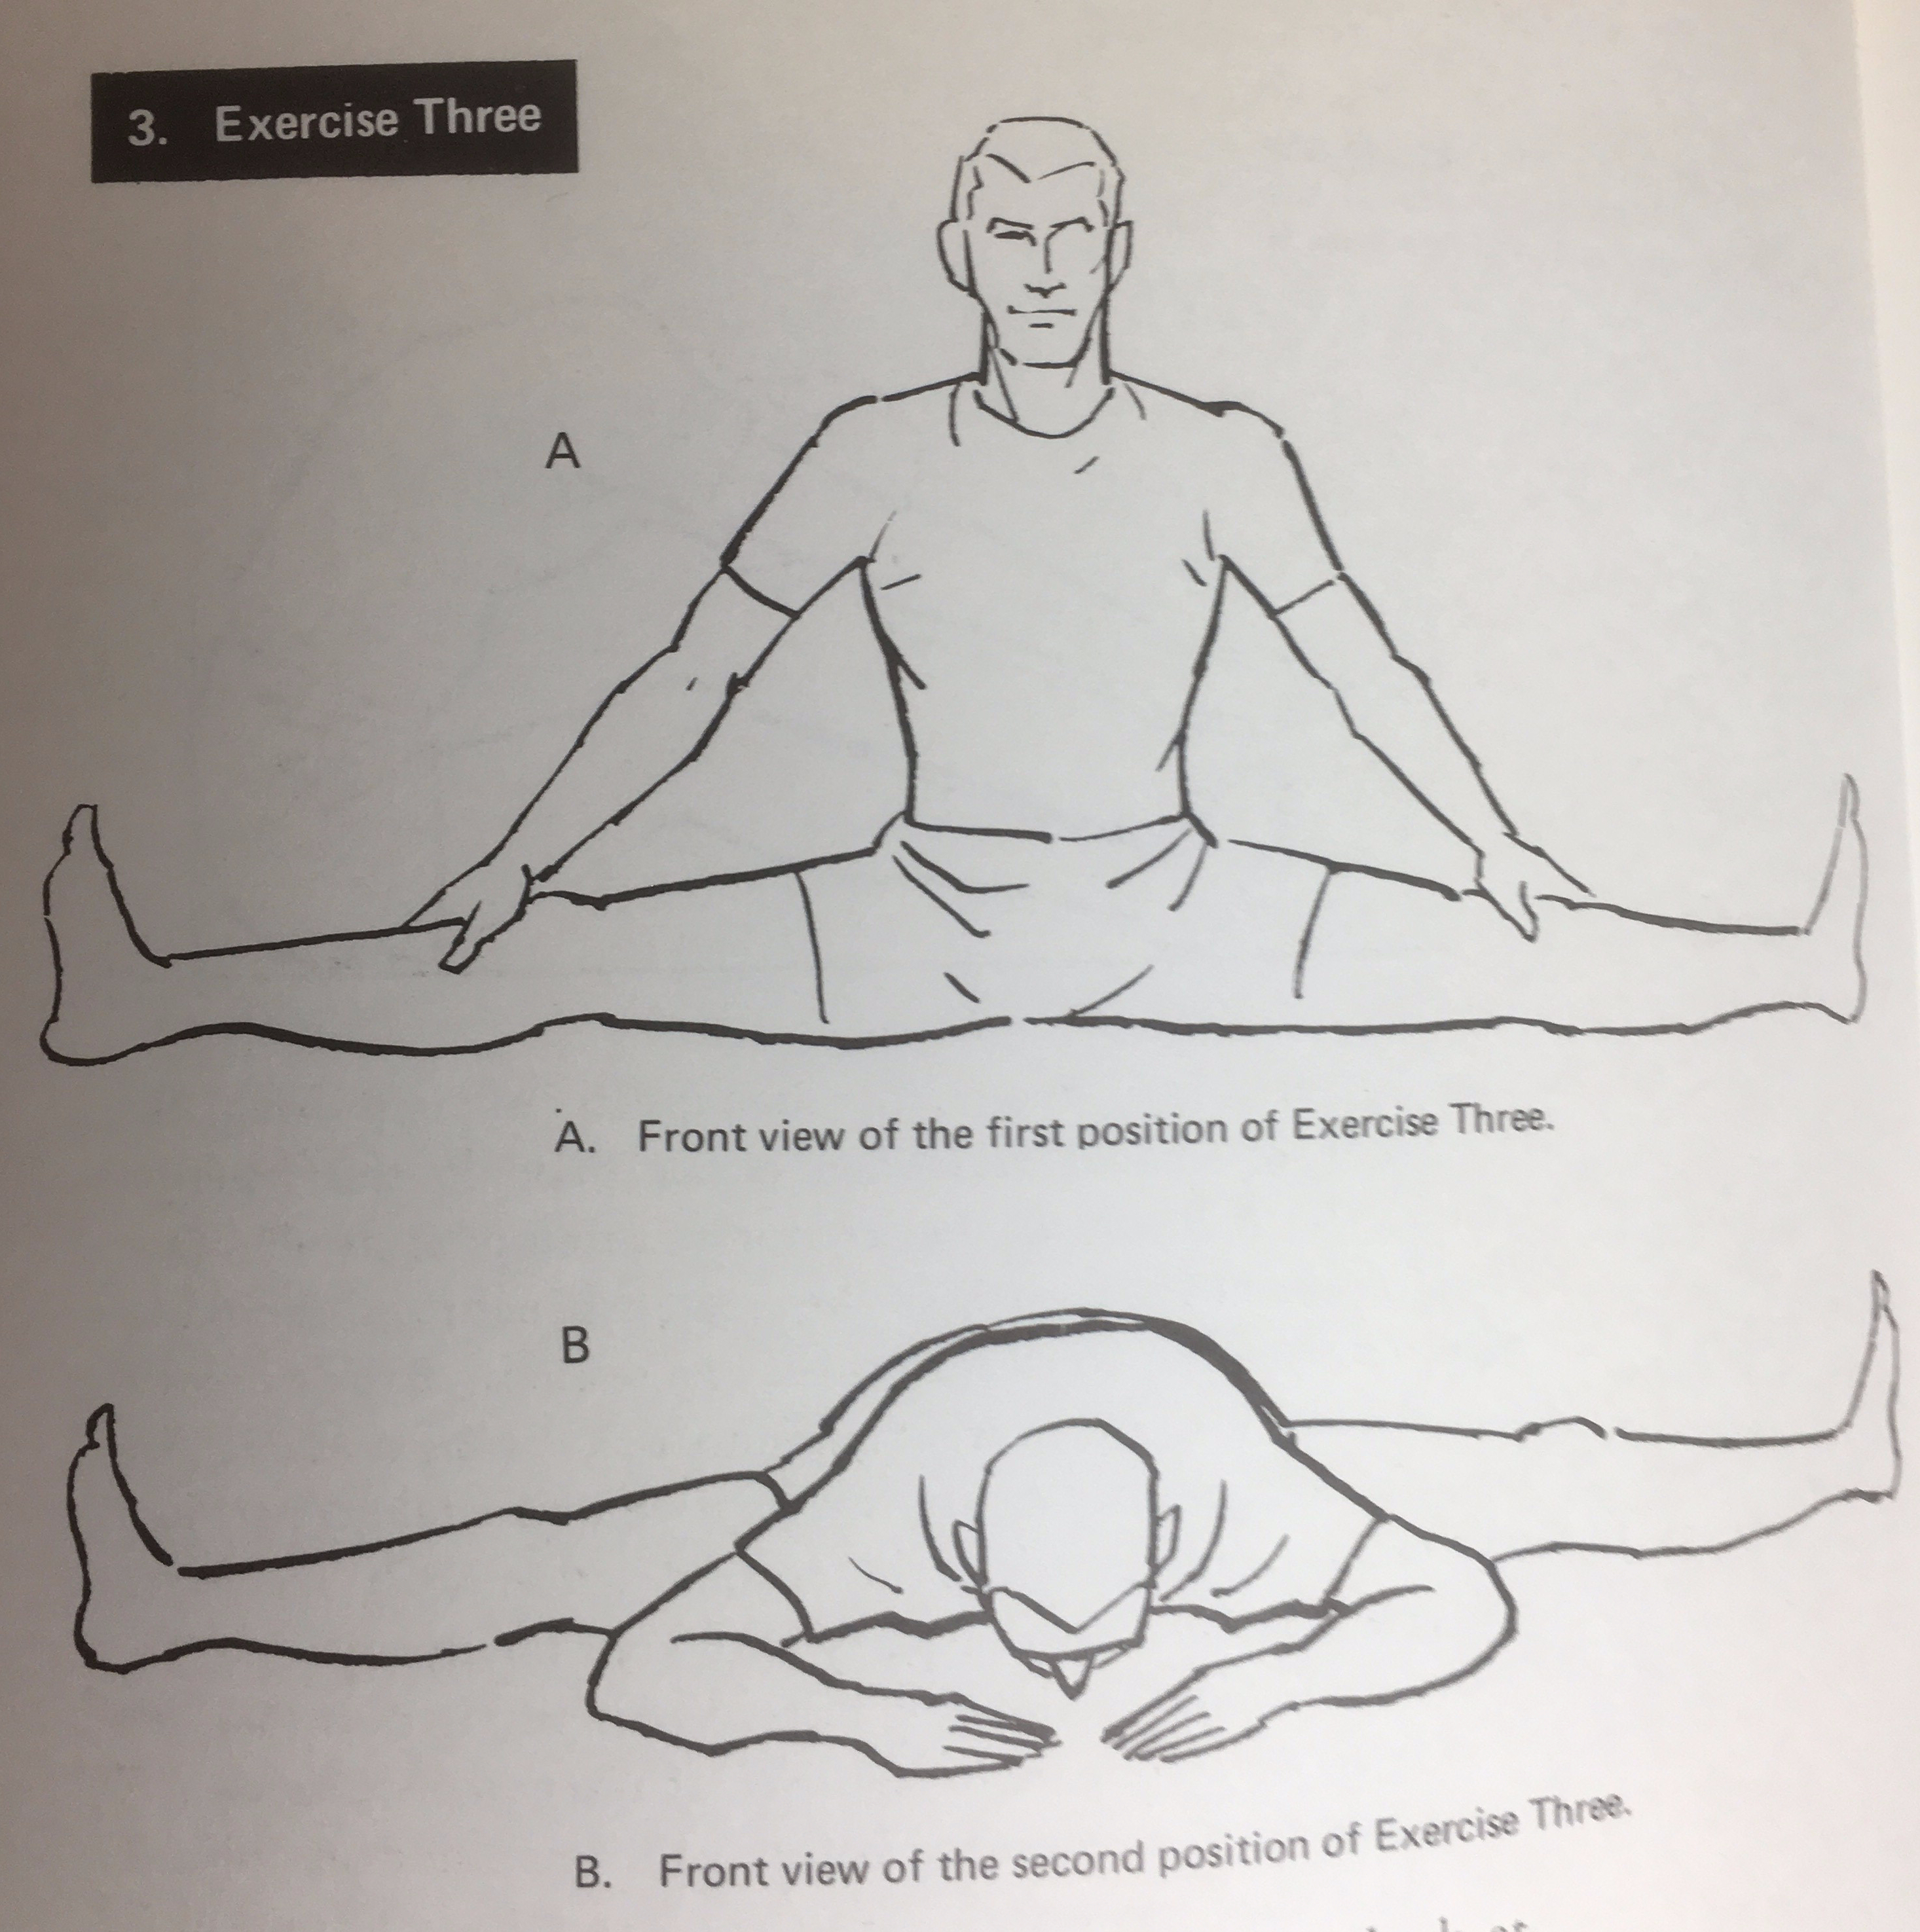 Makko Ho exercise 3 diagram